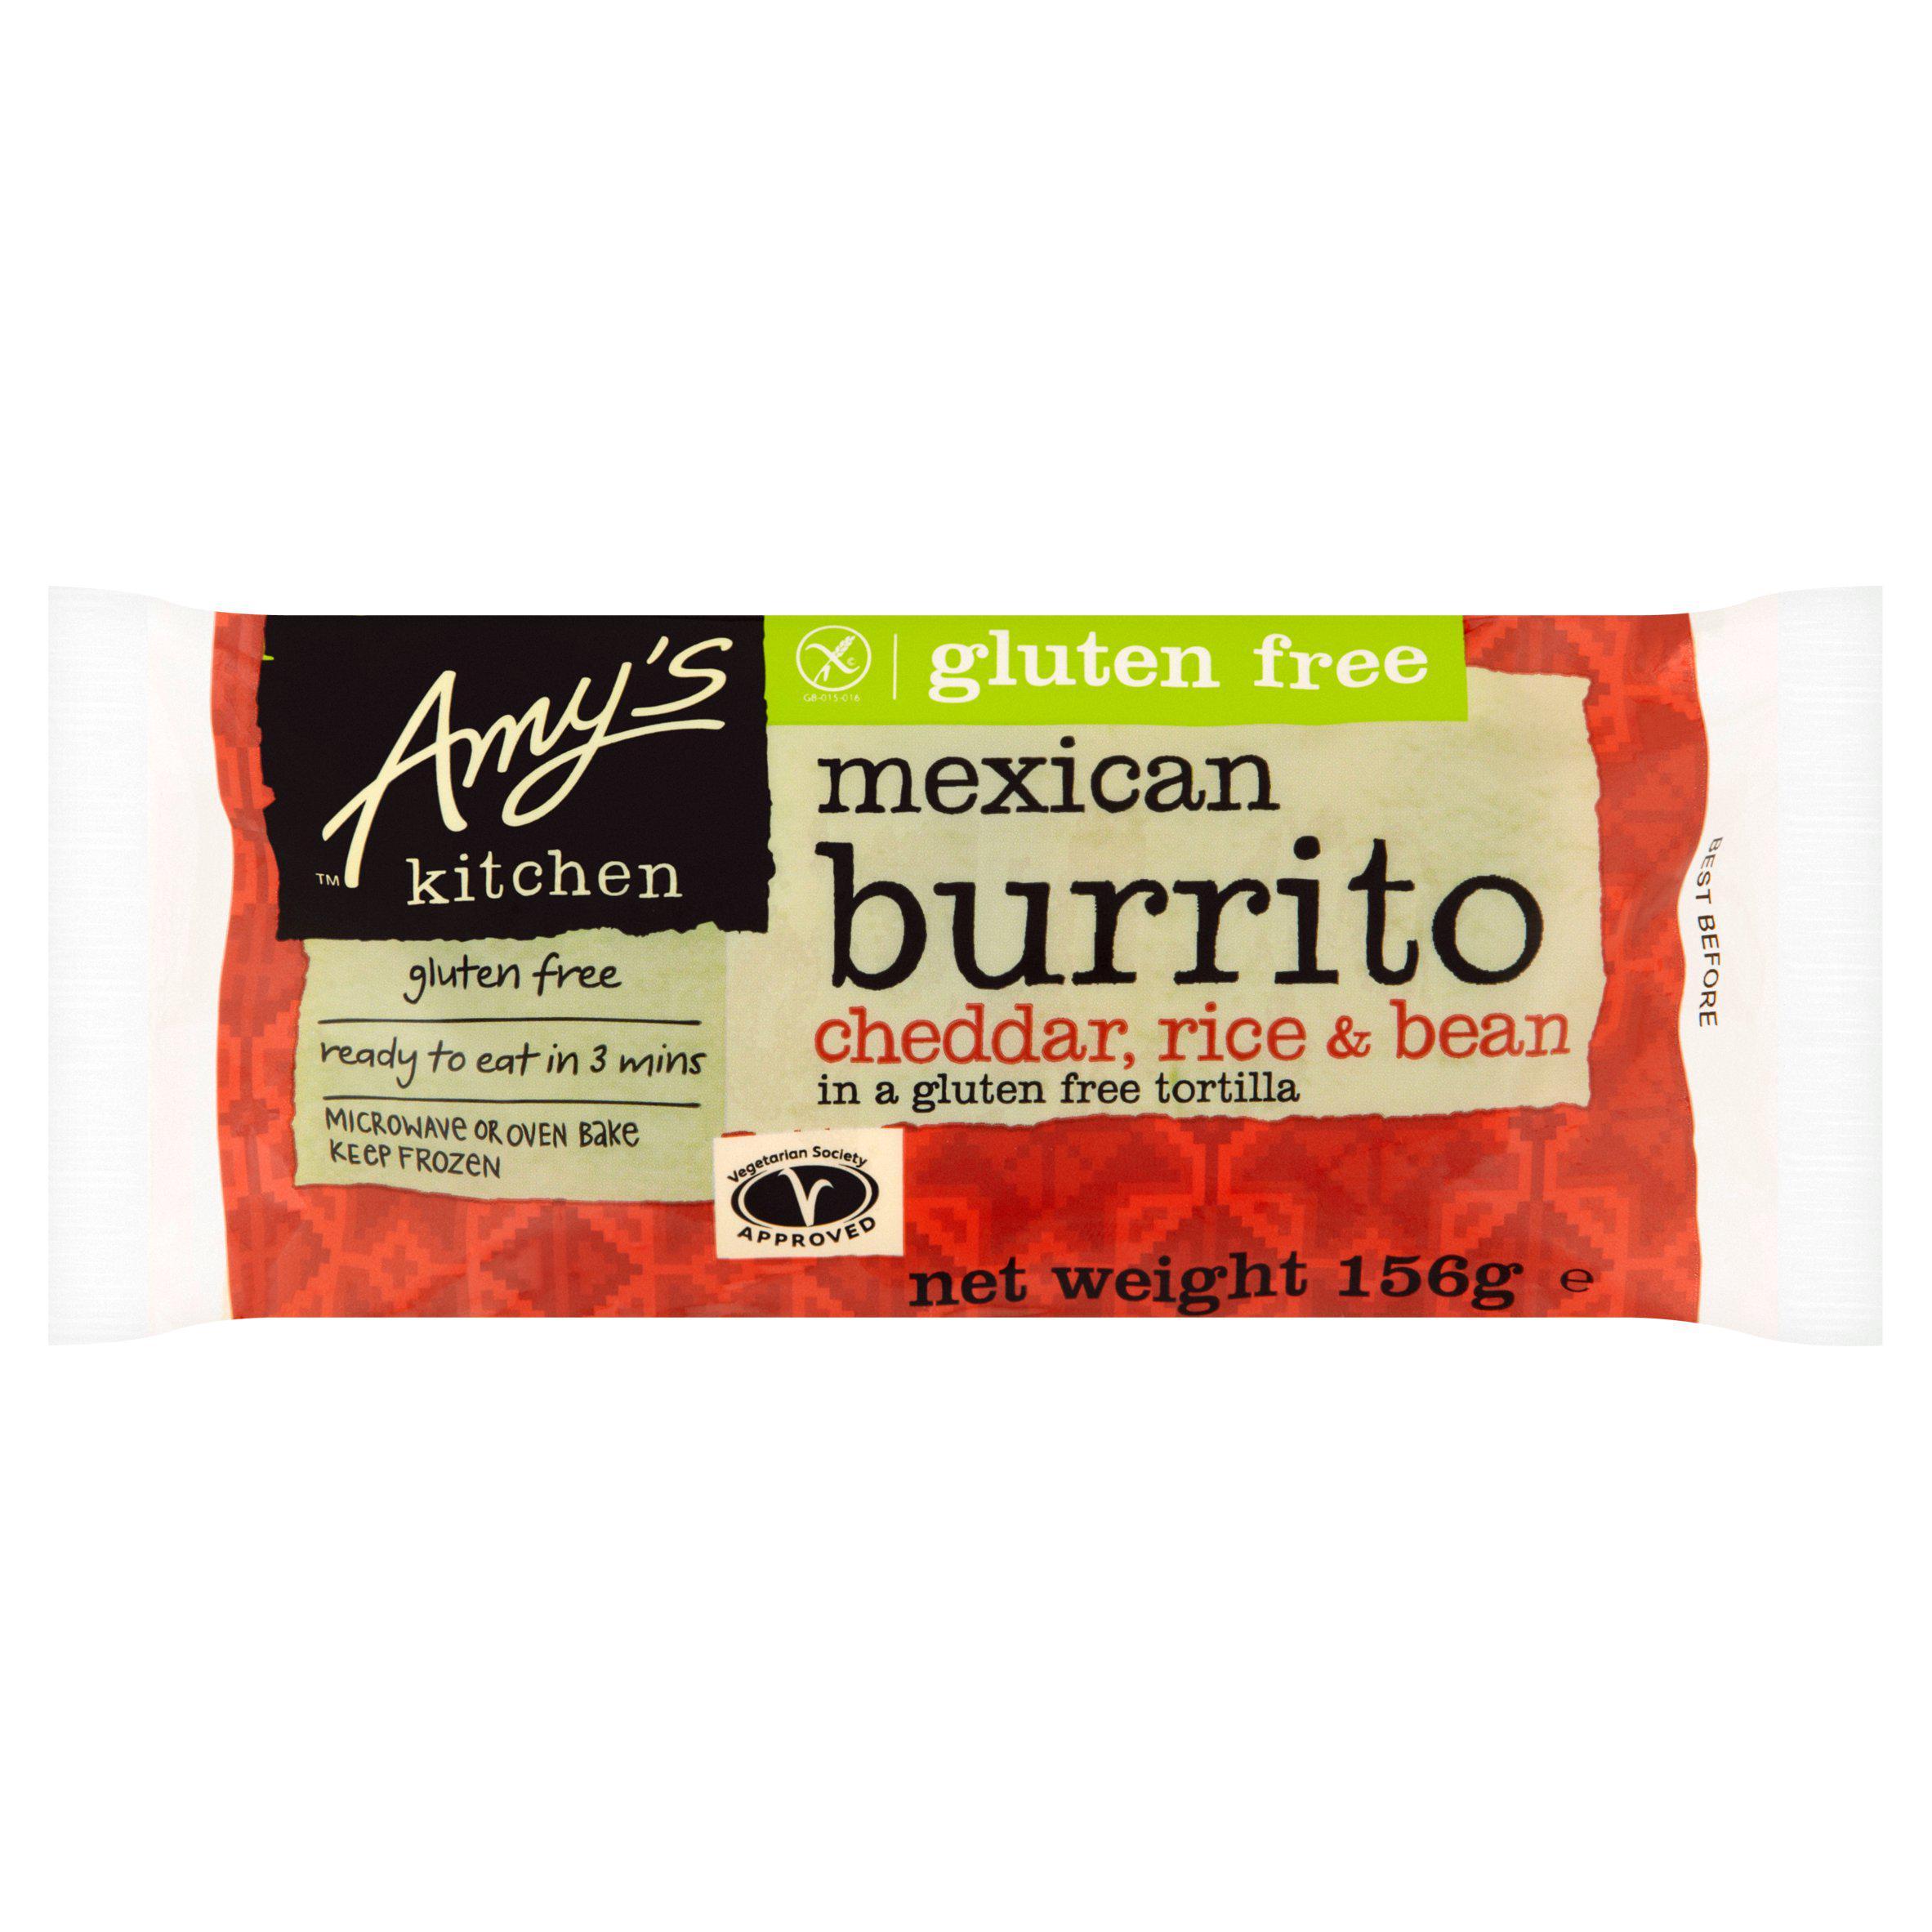 Amys kitchen beans and cheese burrito 170g - 80p at Asda Southampton